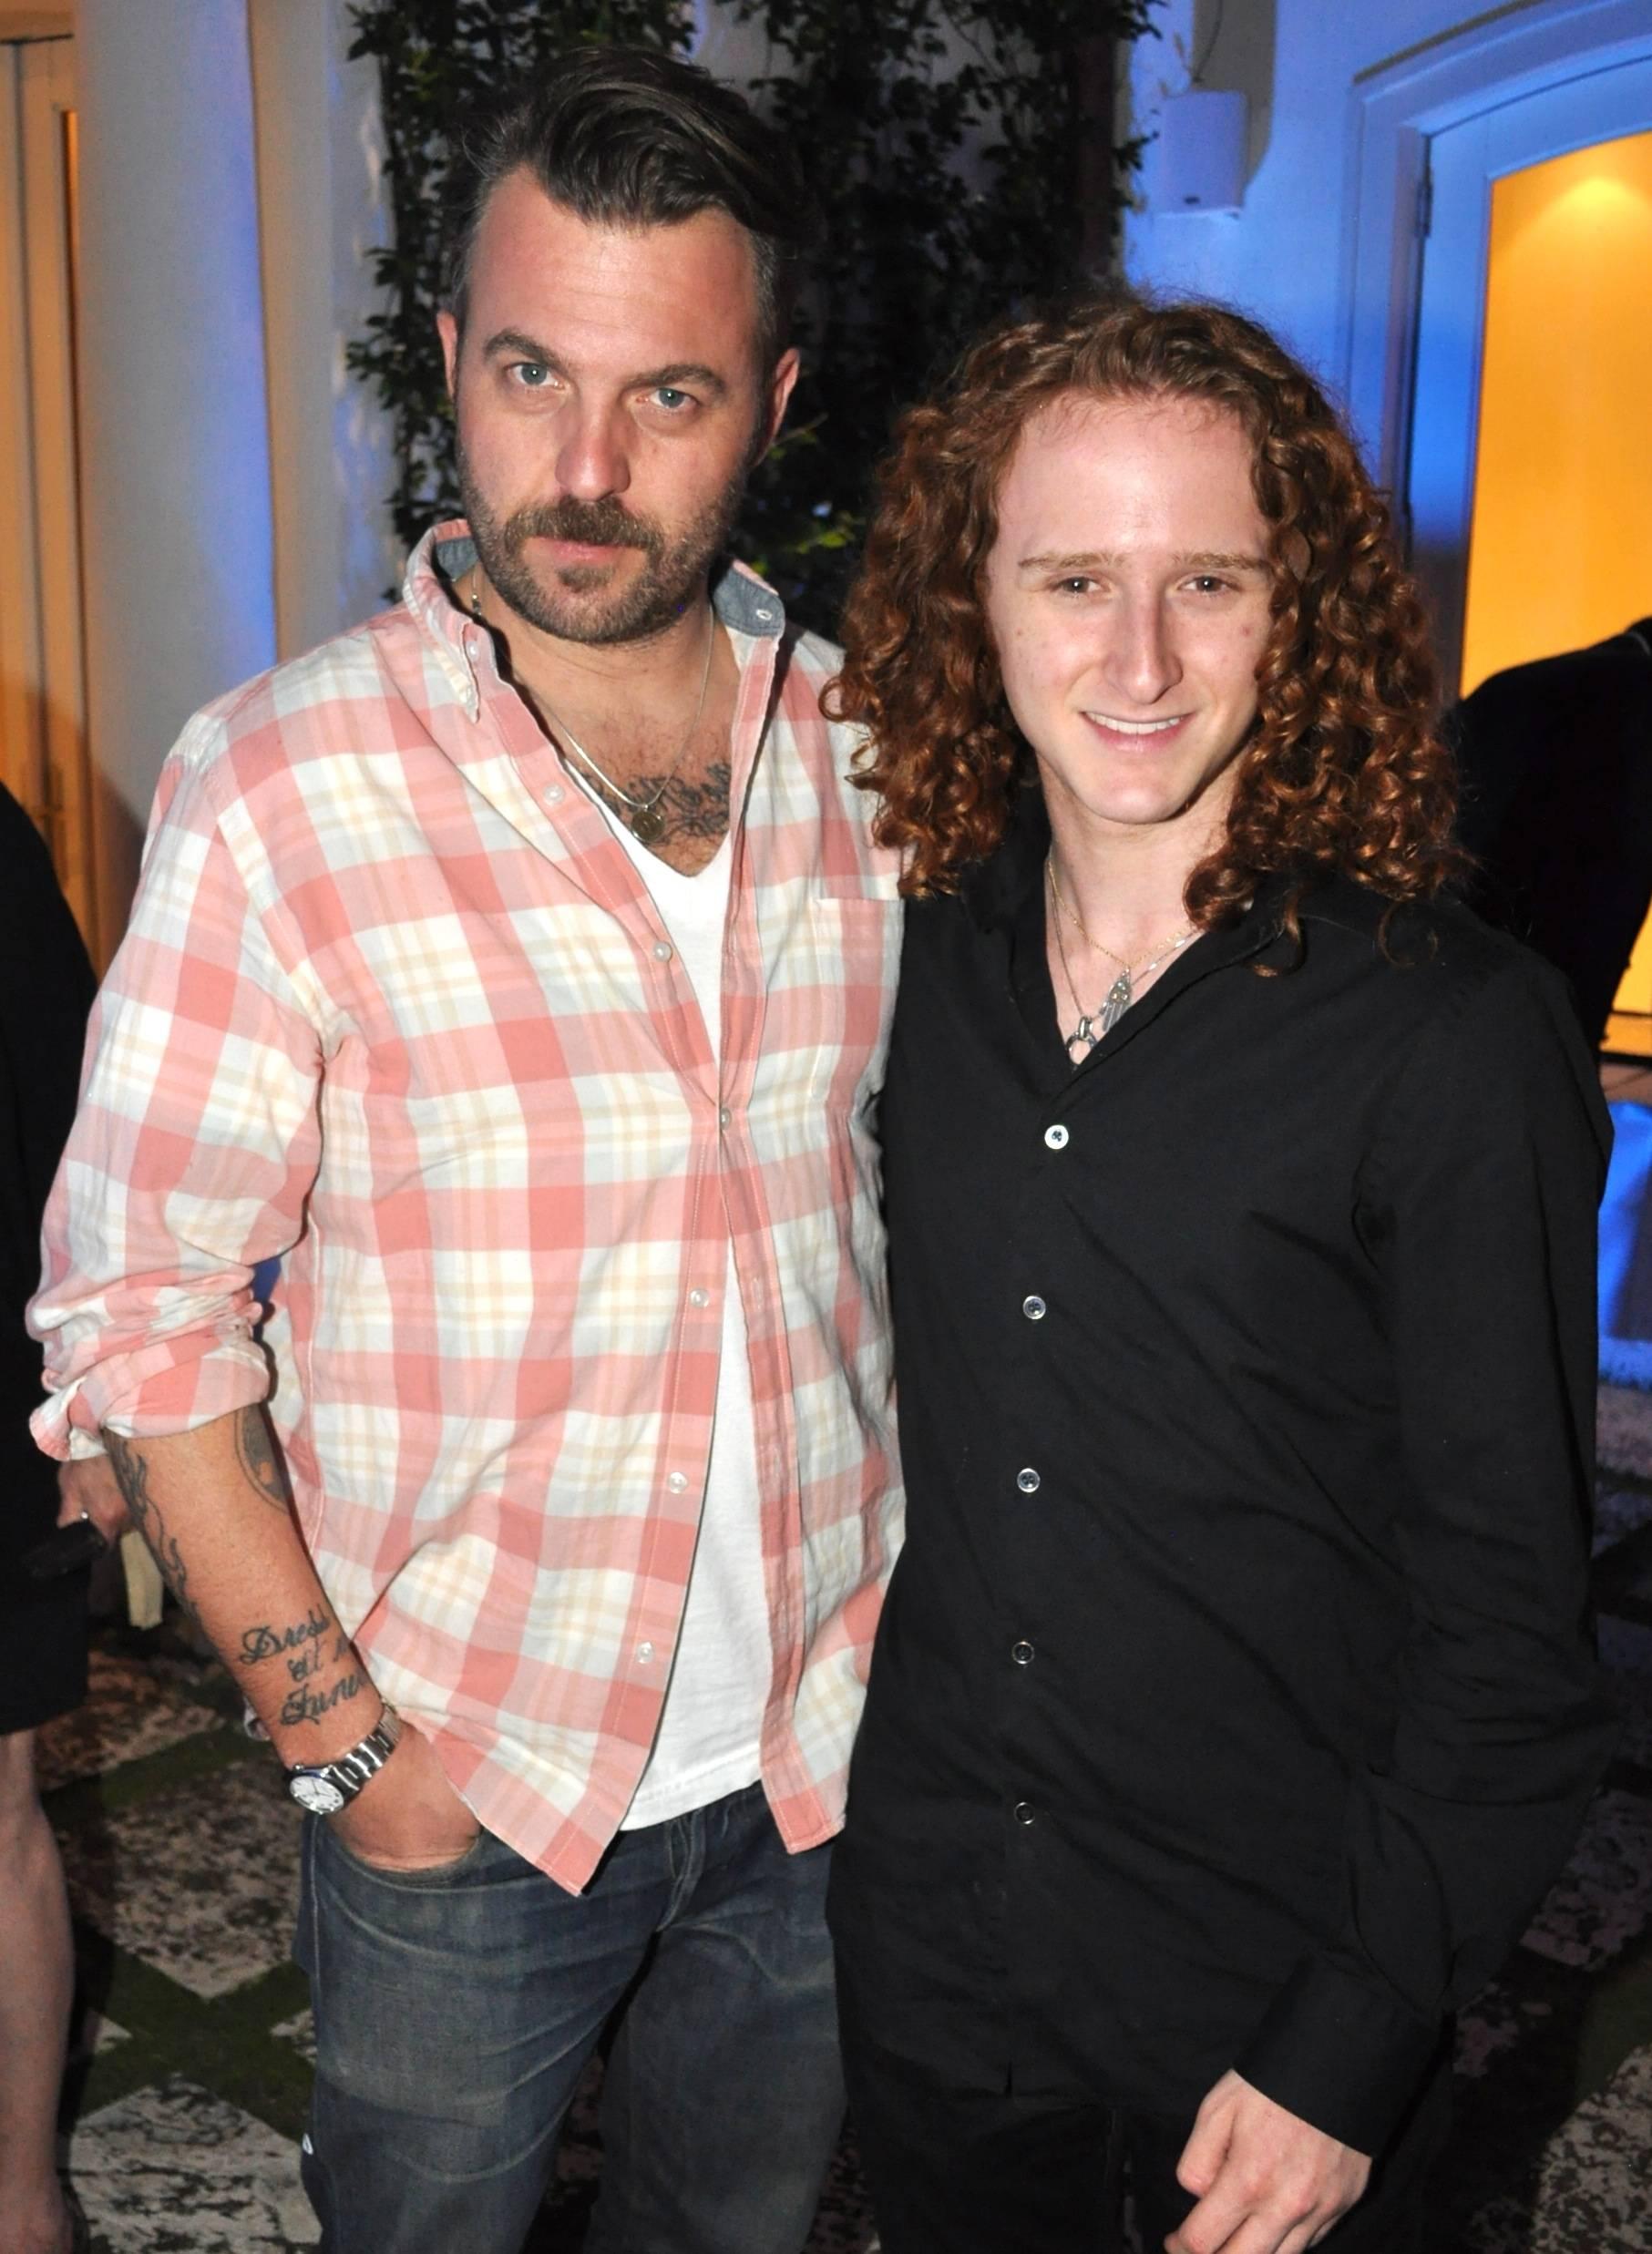 07 Photographer Wyatt Neumann with American Idol Season 10's Brett Loewenstern